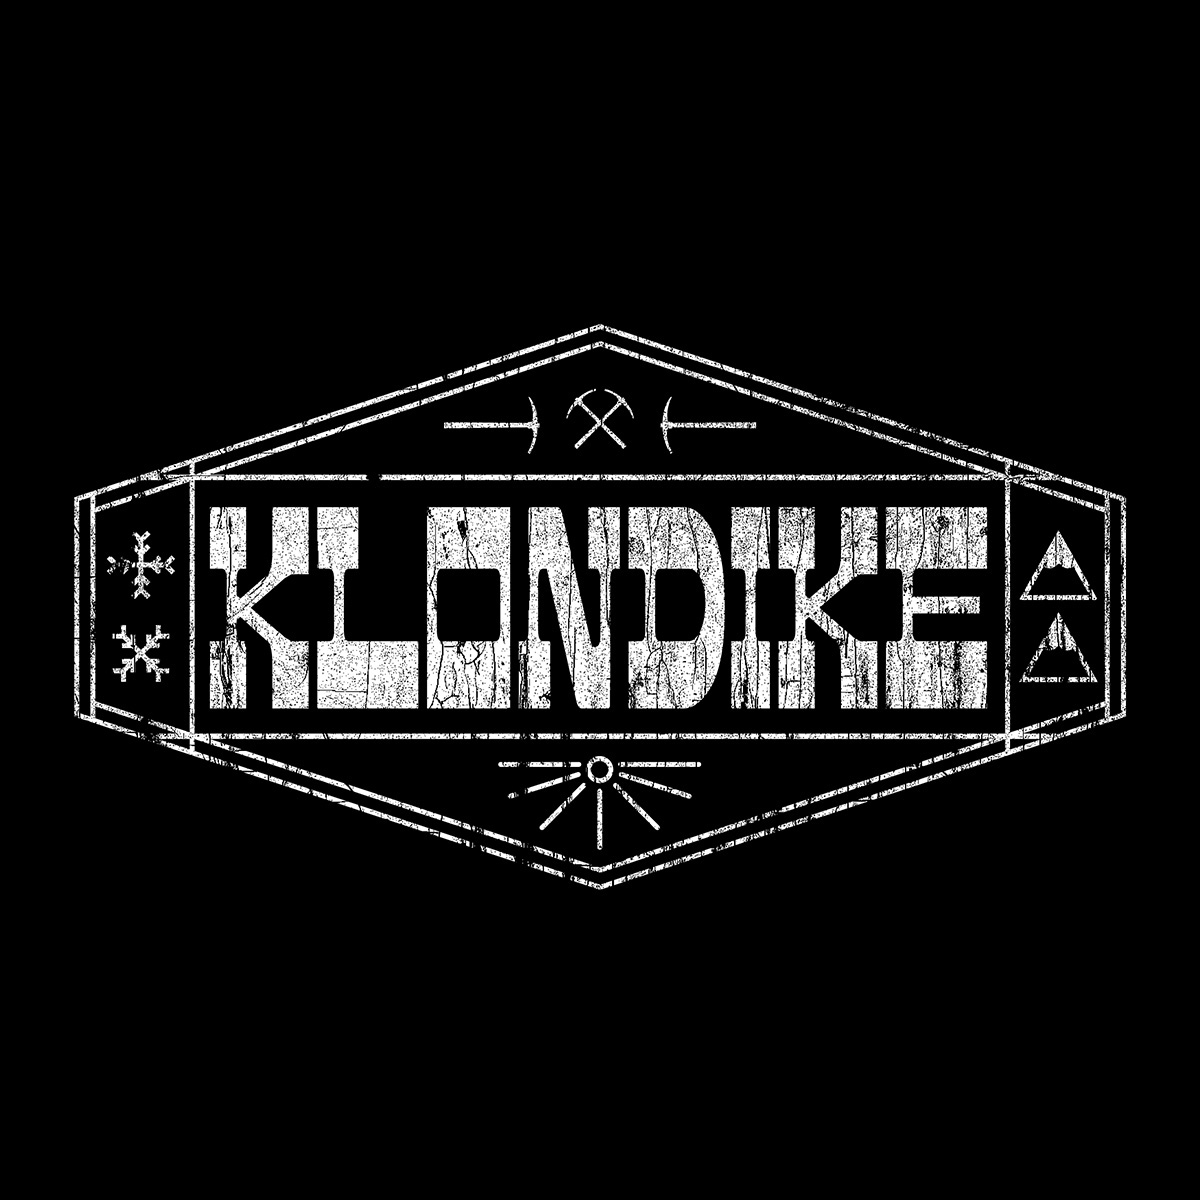 Discovery_Channel_Klondike_mini-series_mattson_design.jpg